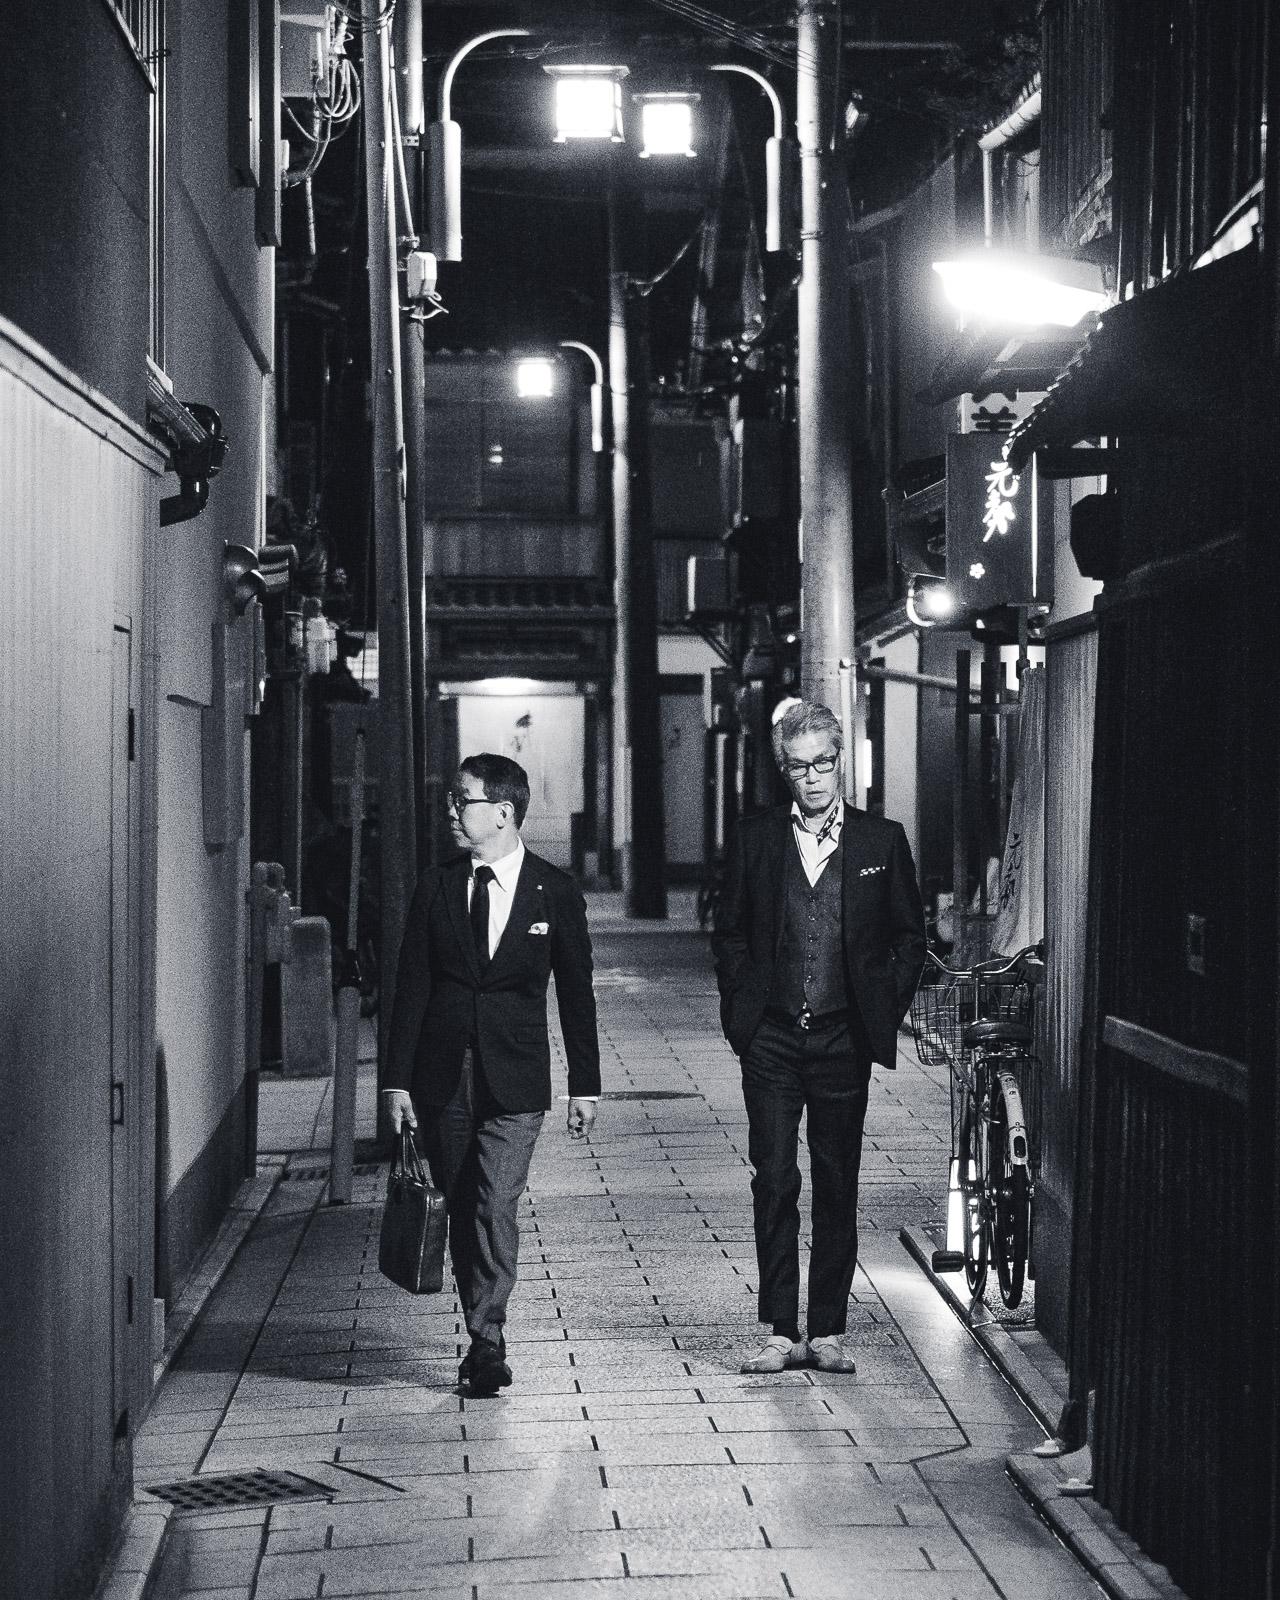 Japan-Street-Photography-People-11.jpg